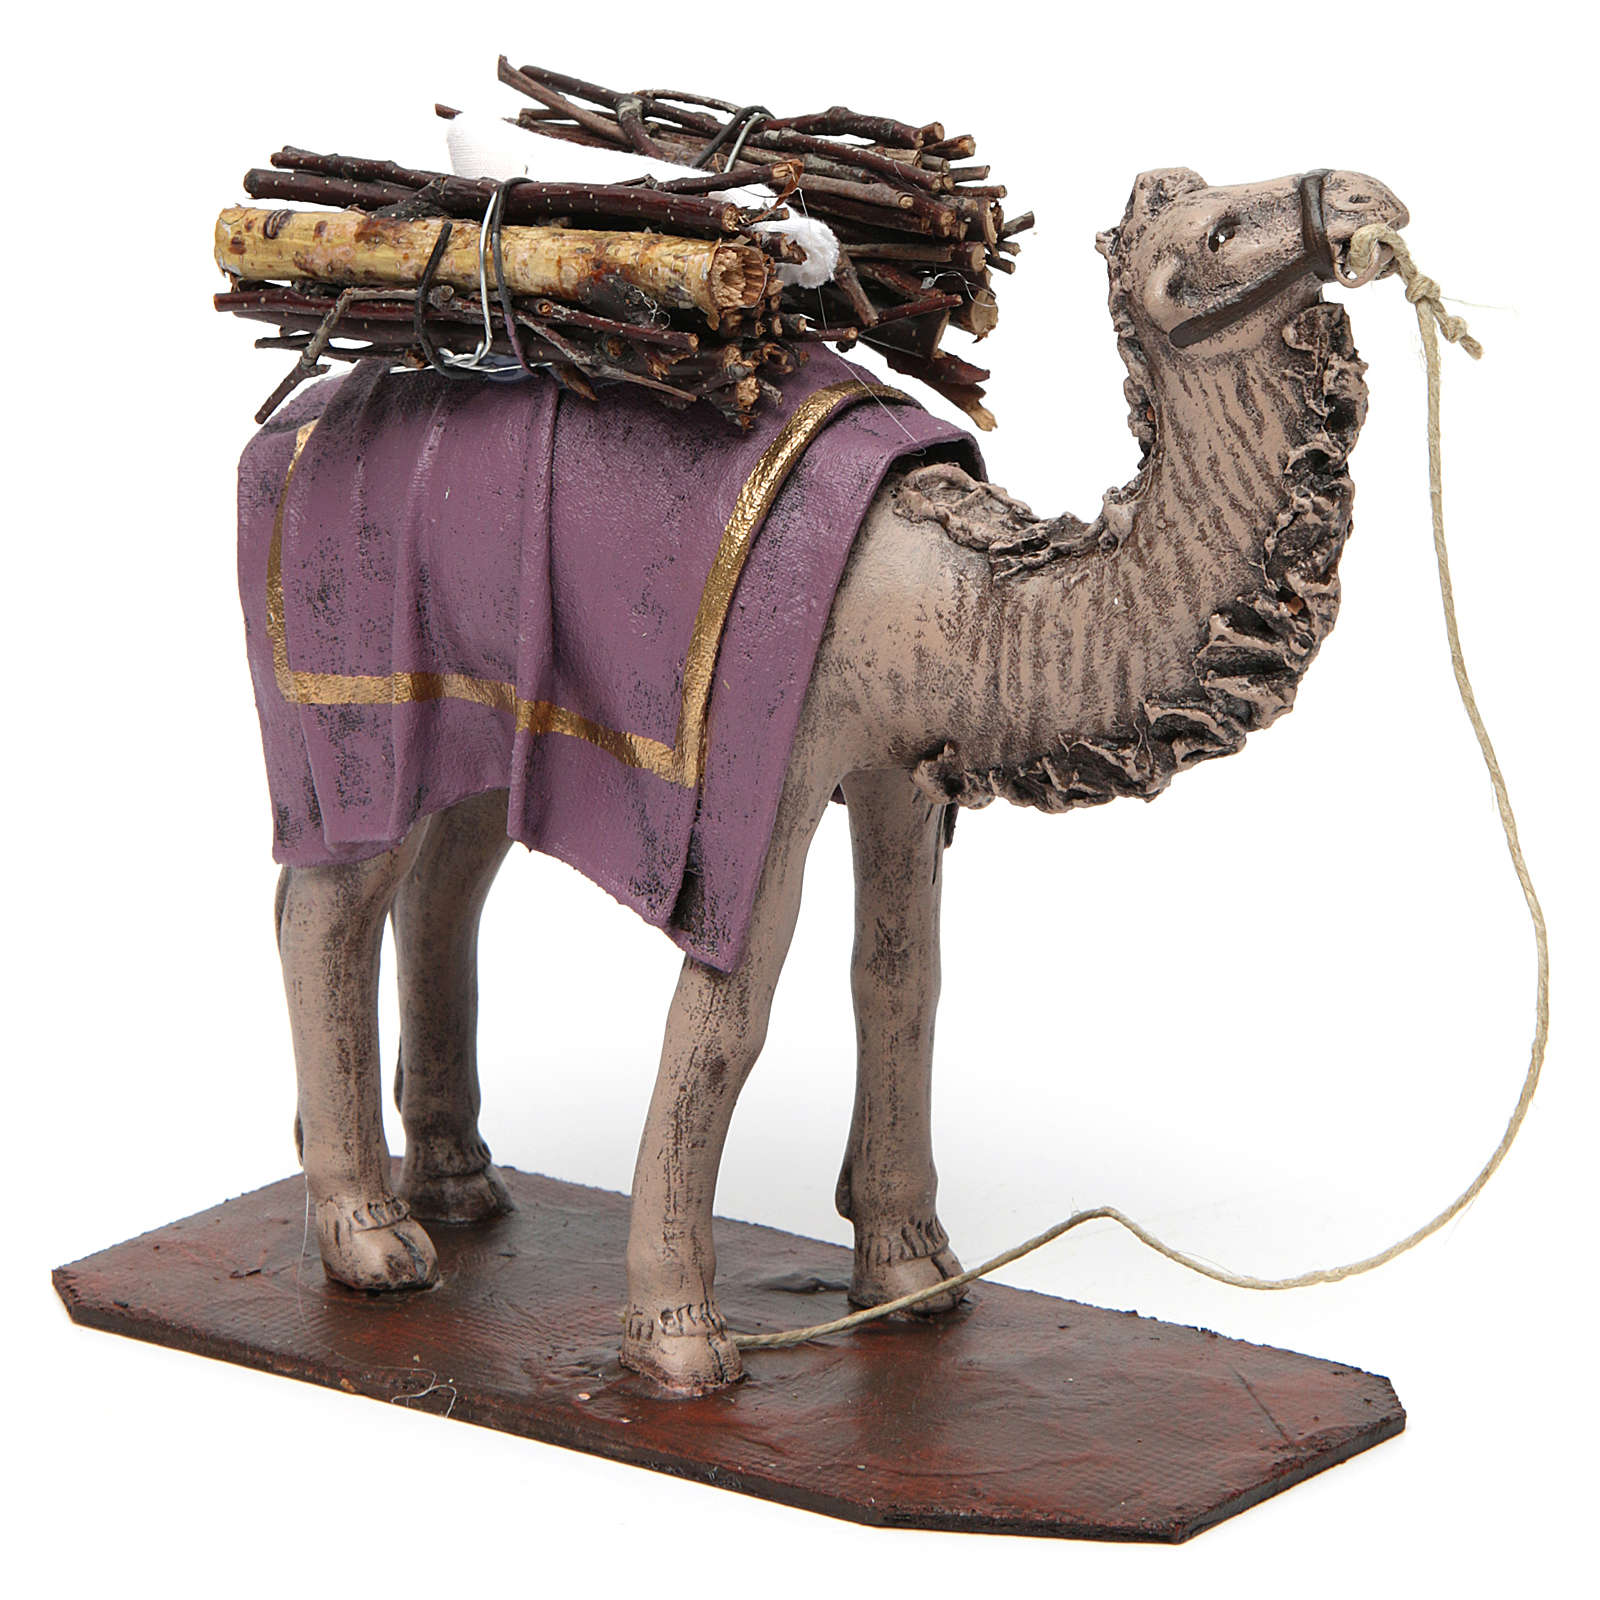 b701b0eaf3b Camello de pie con cargo belén 14 cm de altura media terracota 3